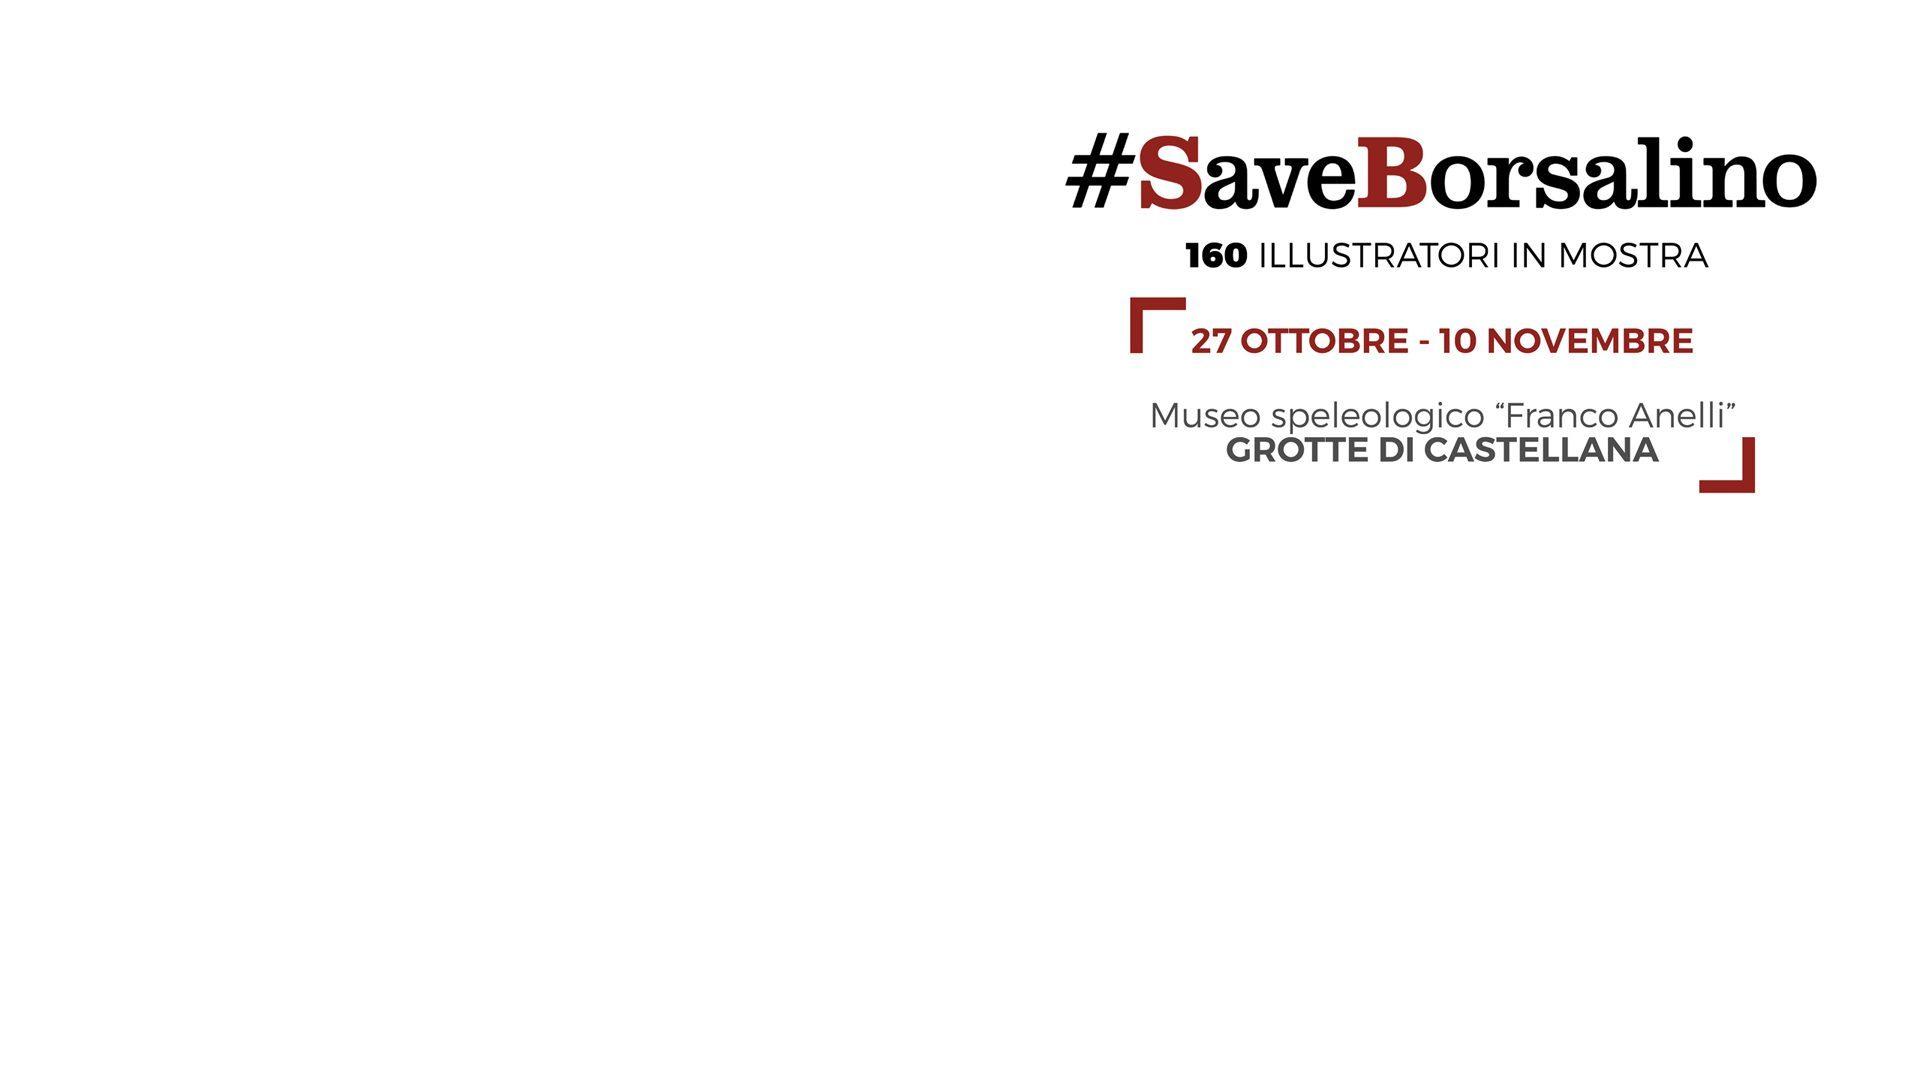 Save Borsalino